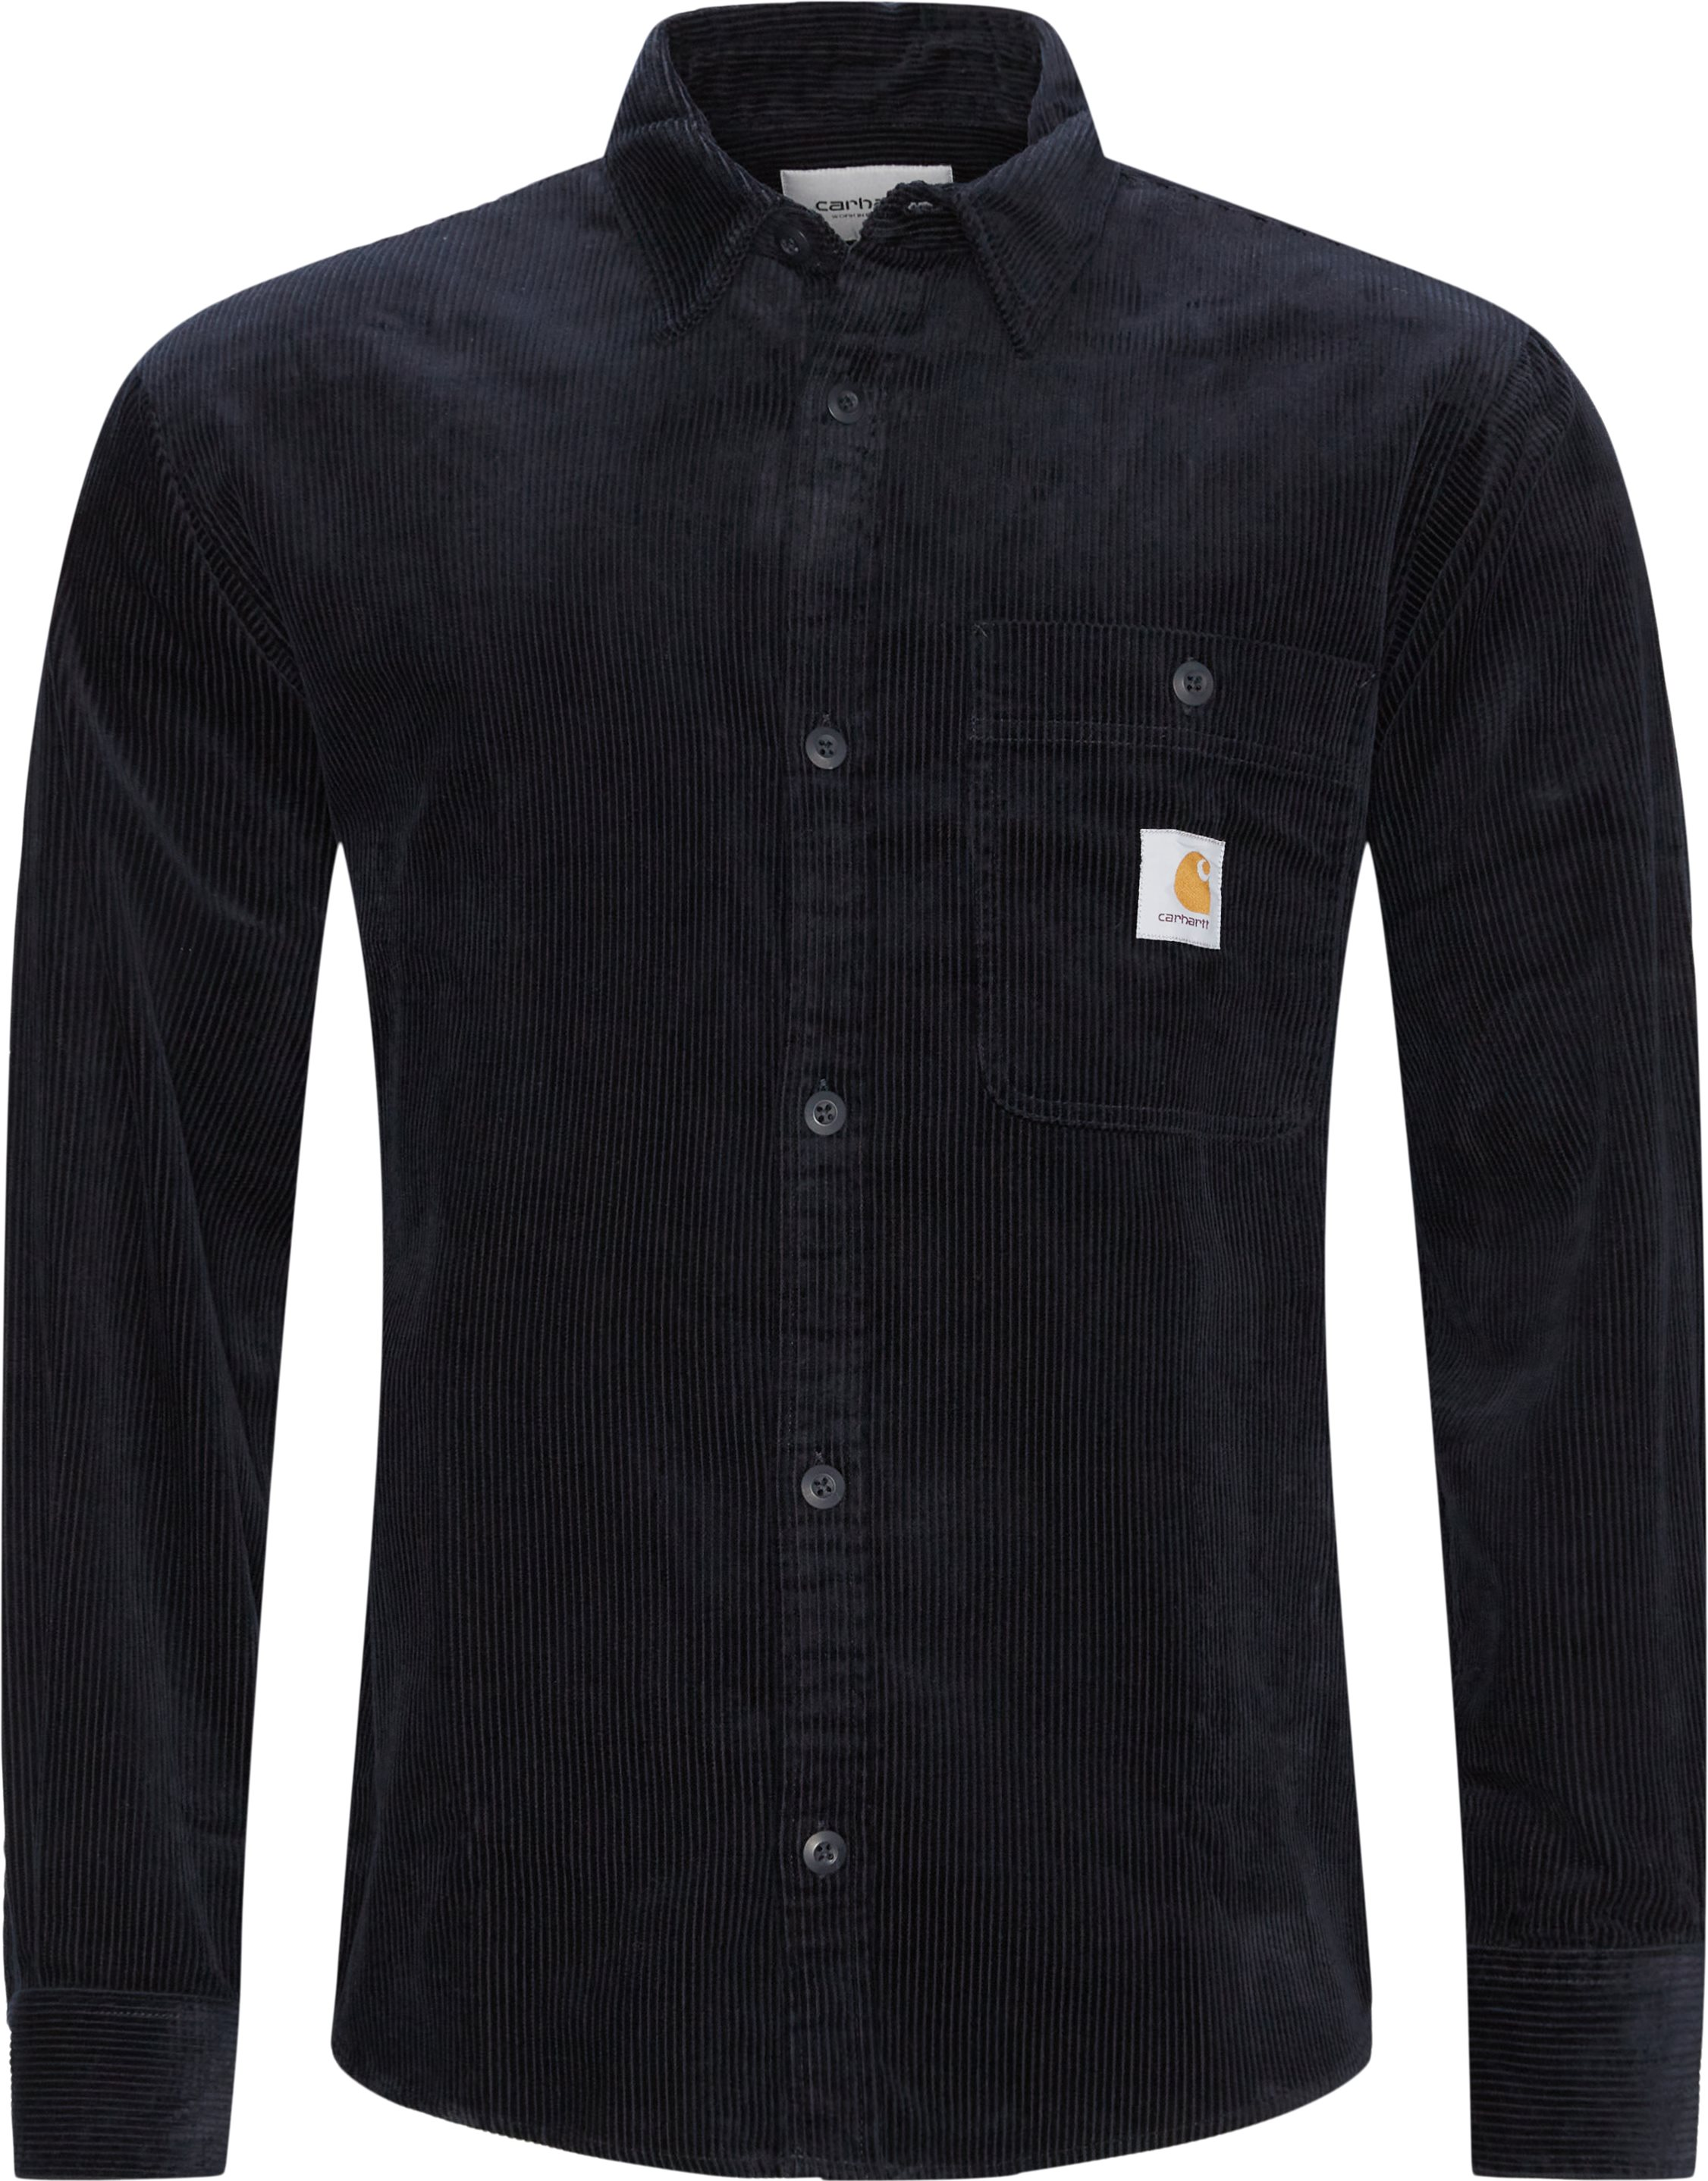 Flint L/æ Skjorte - Skjortor - Regular fit - Blå